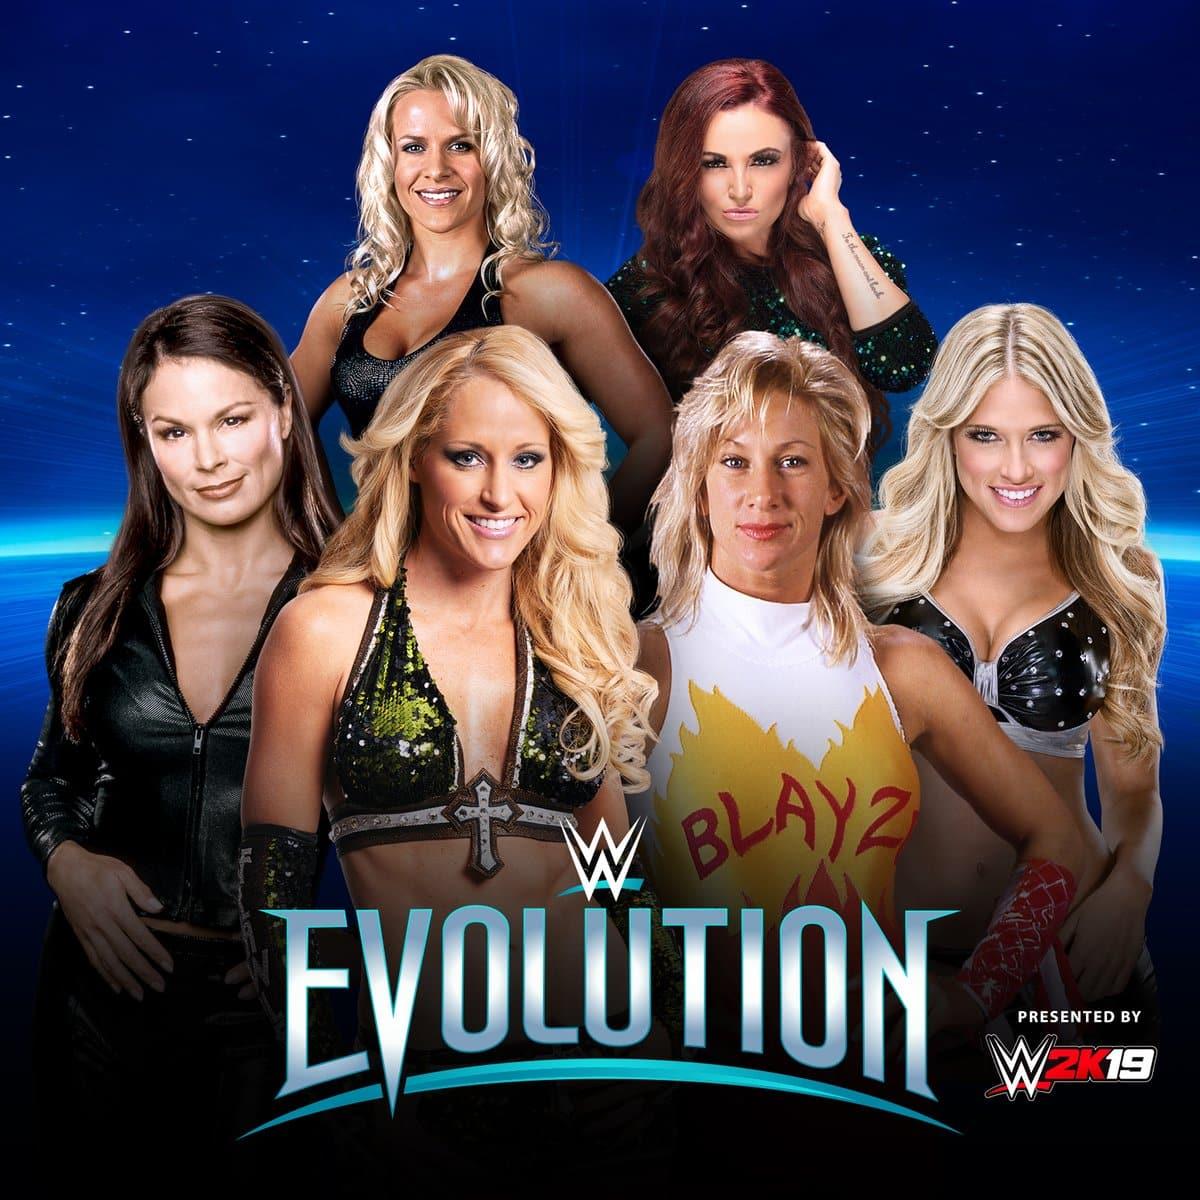 ¡WWE confirma lucha para seis ex luchadoras en Evolution! 1